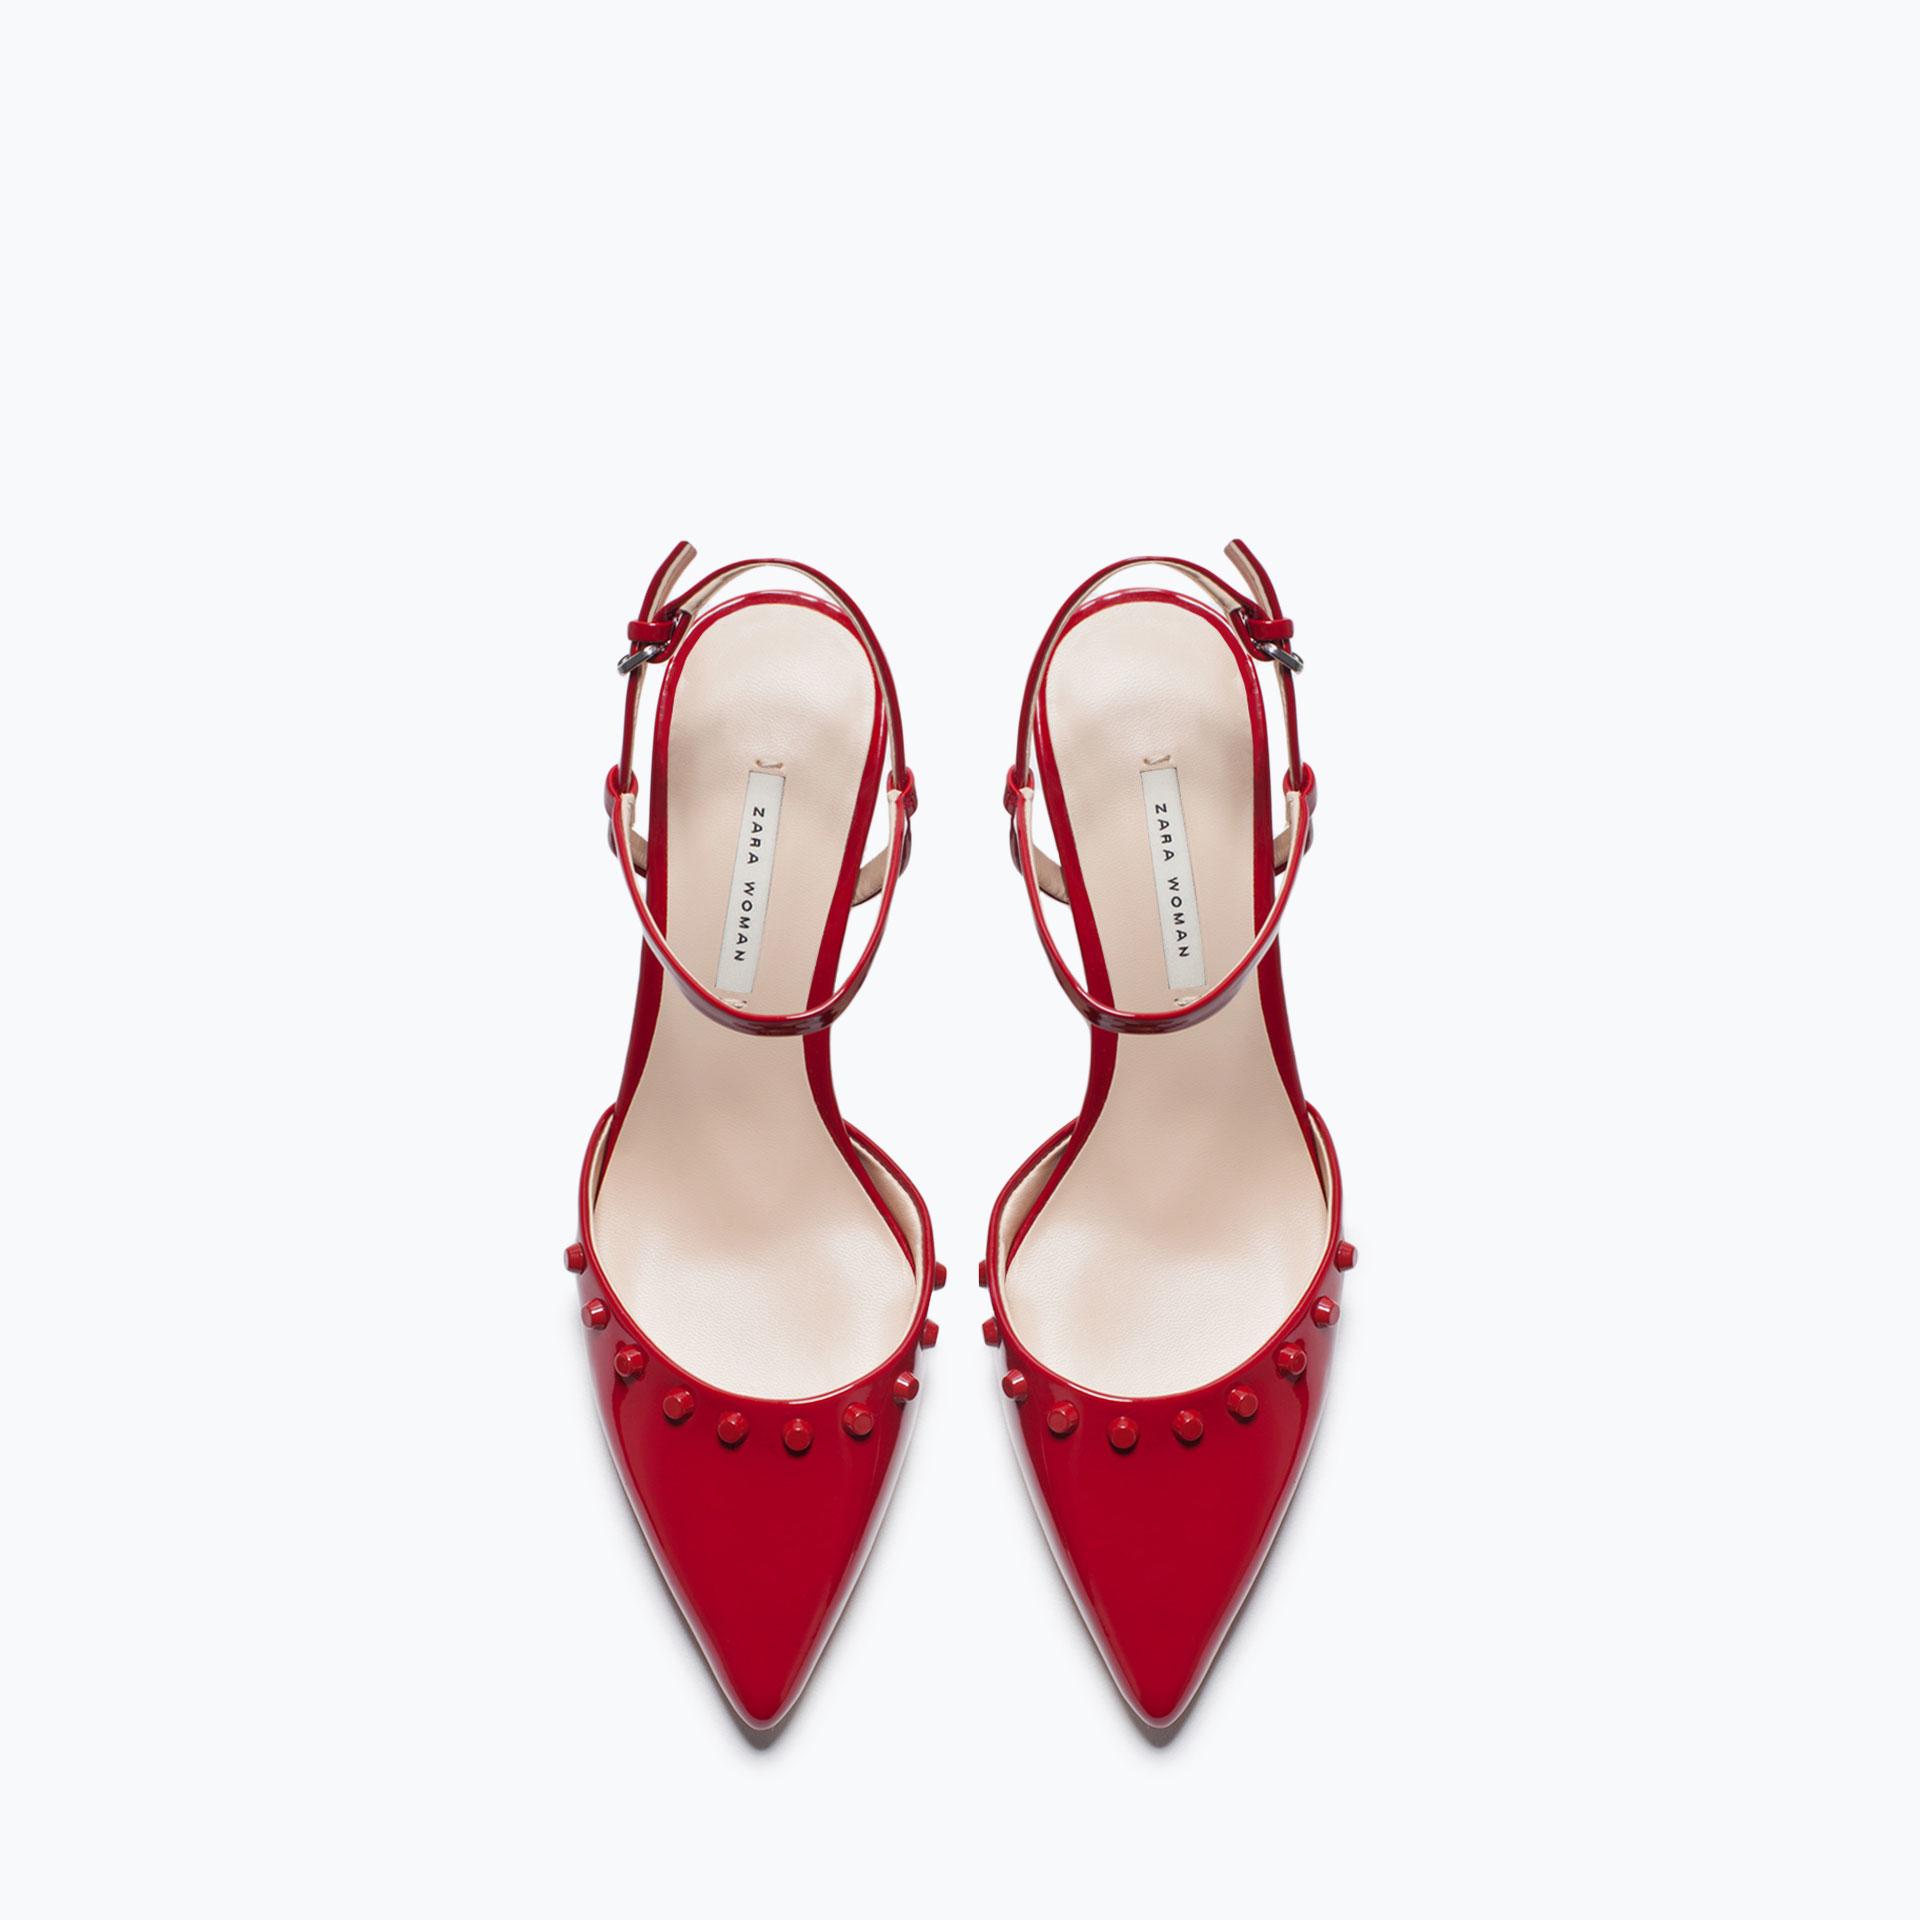 Zara Kitten Heel Studded Shoes